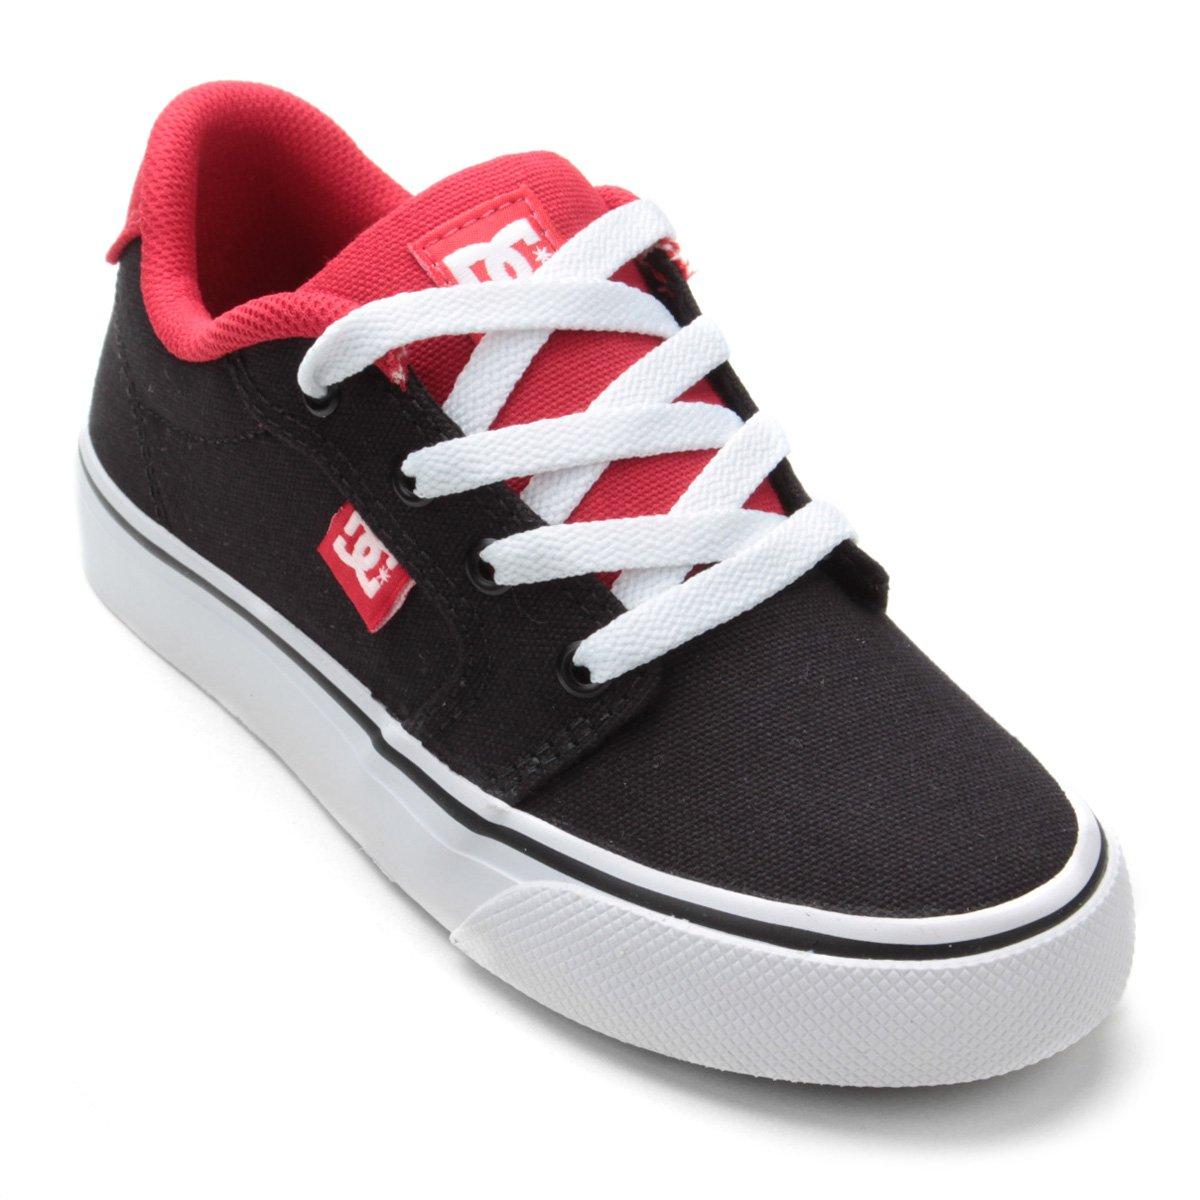 42014f68ba ... Tênis Infantil DC Shoes Anvil Tx La Masculino - Preto e Vermelho .